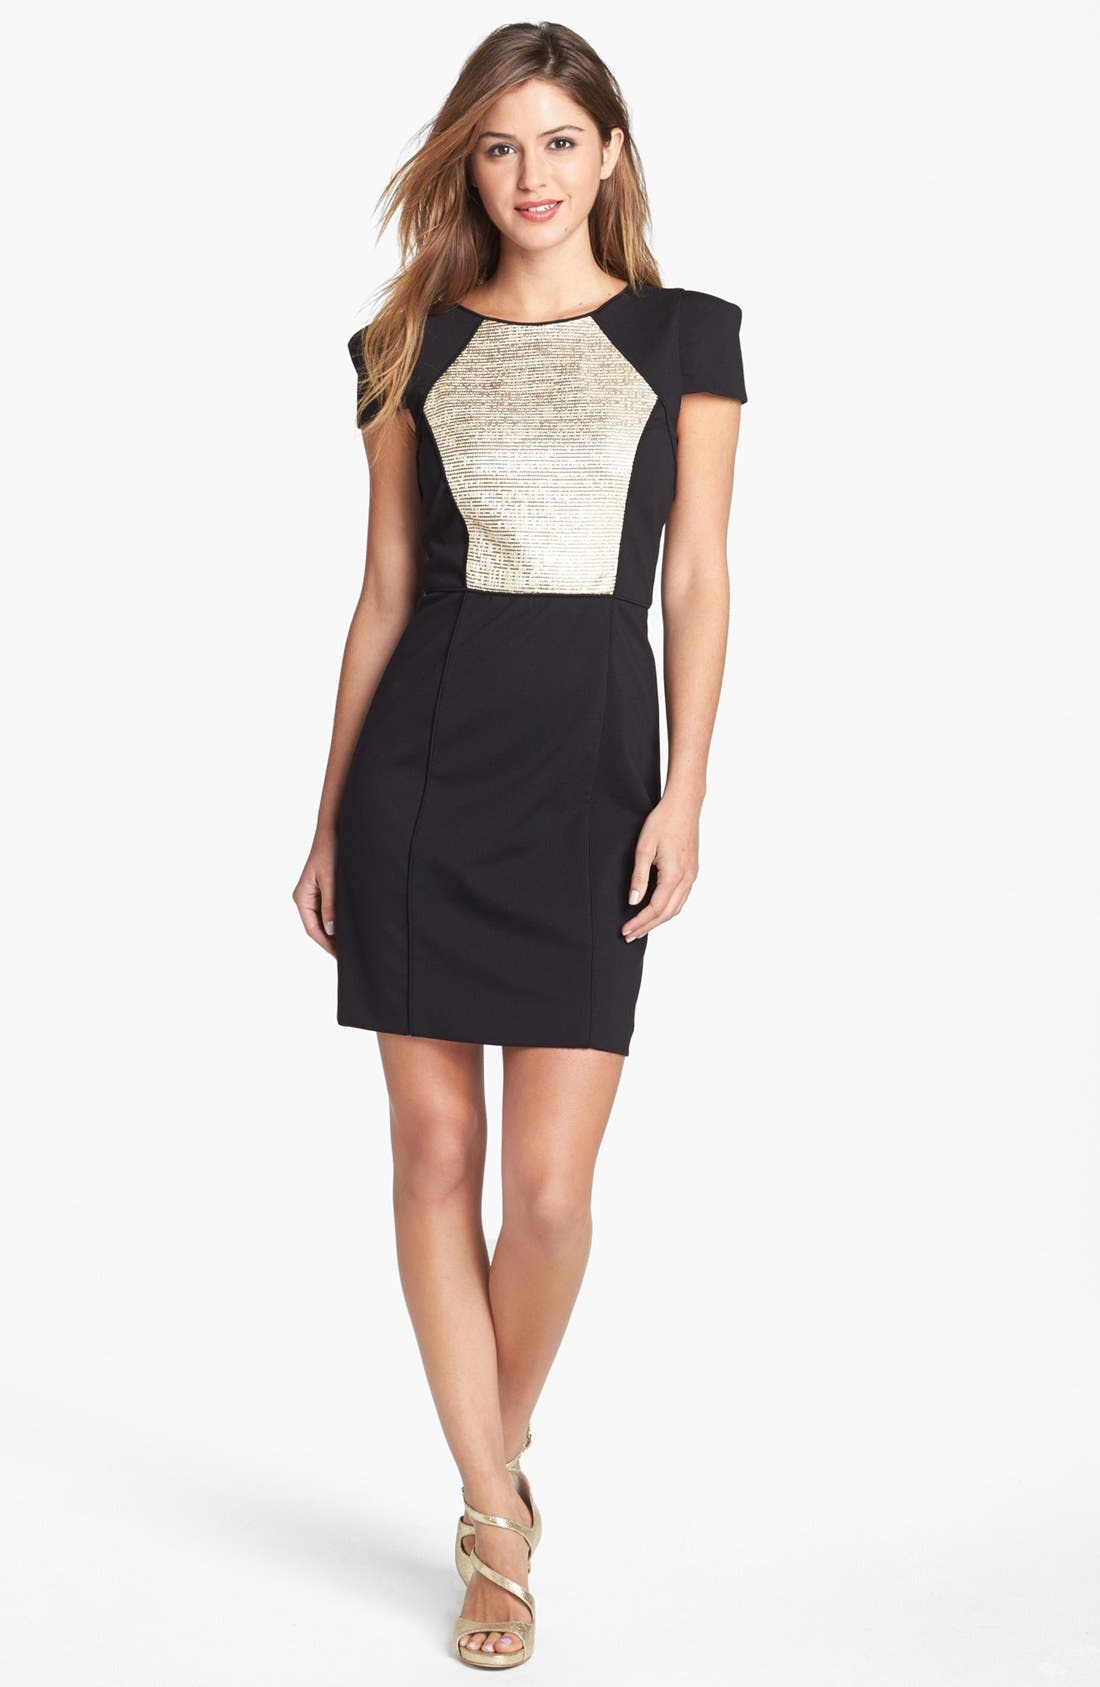 Main Image - 4.collective Metallic Panel Knit Sheath Dress